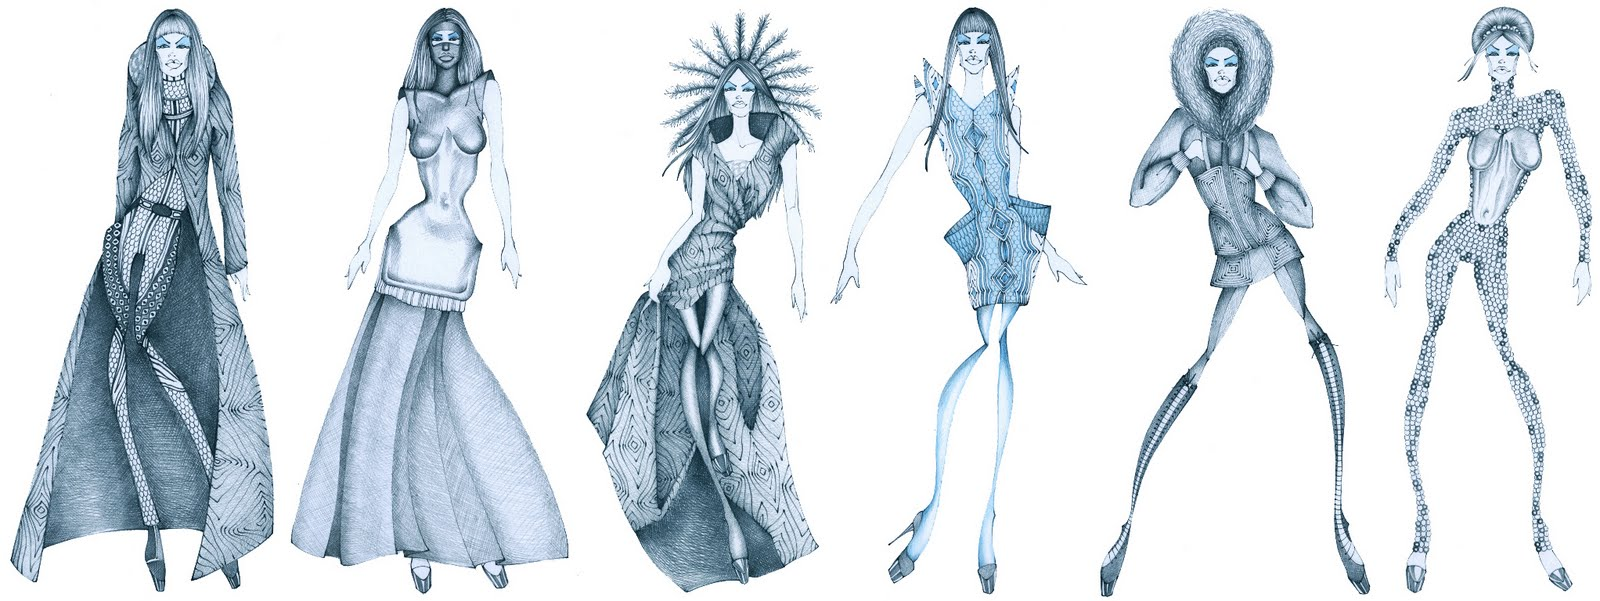 Alexander Mcqueen Original Sketches